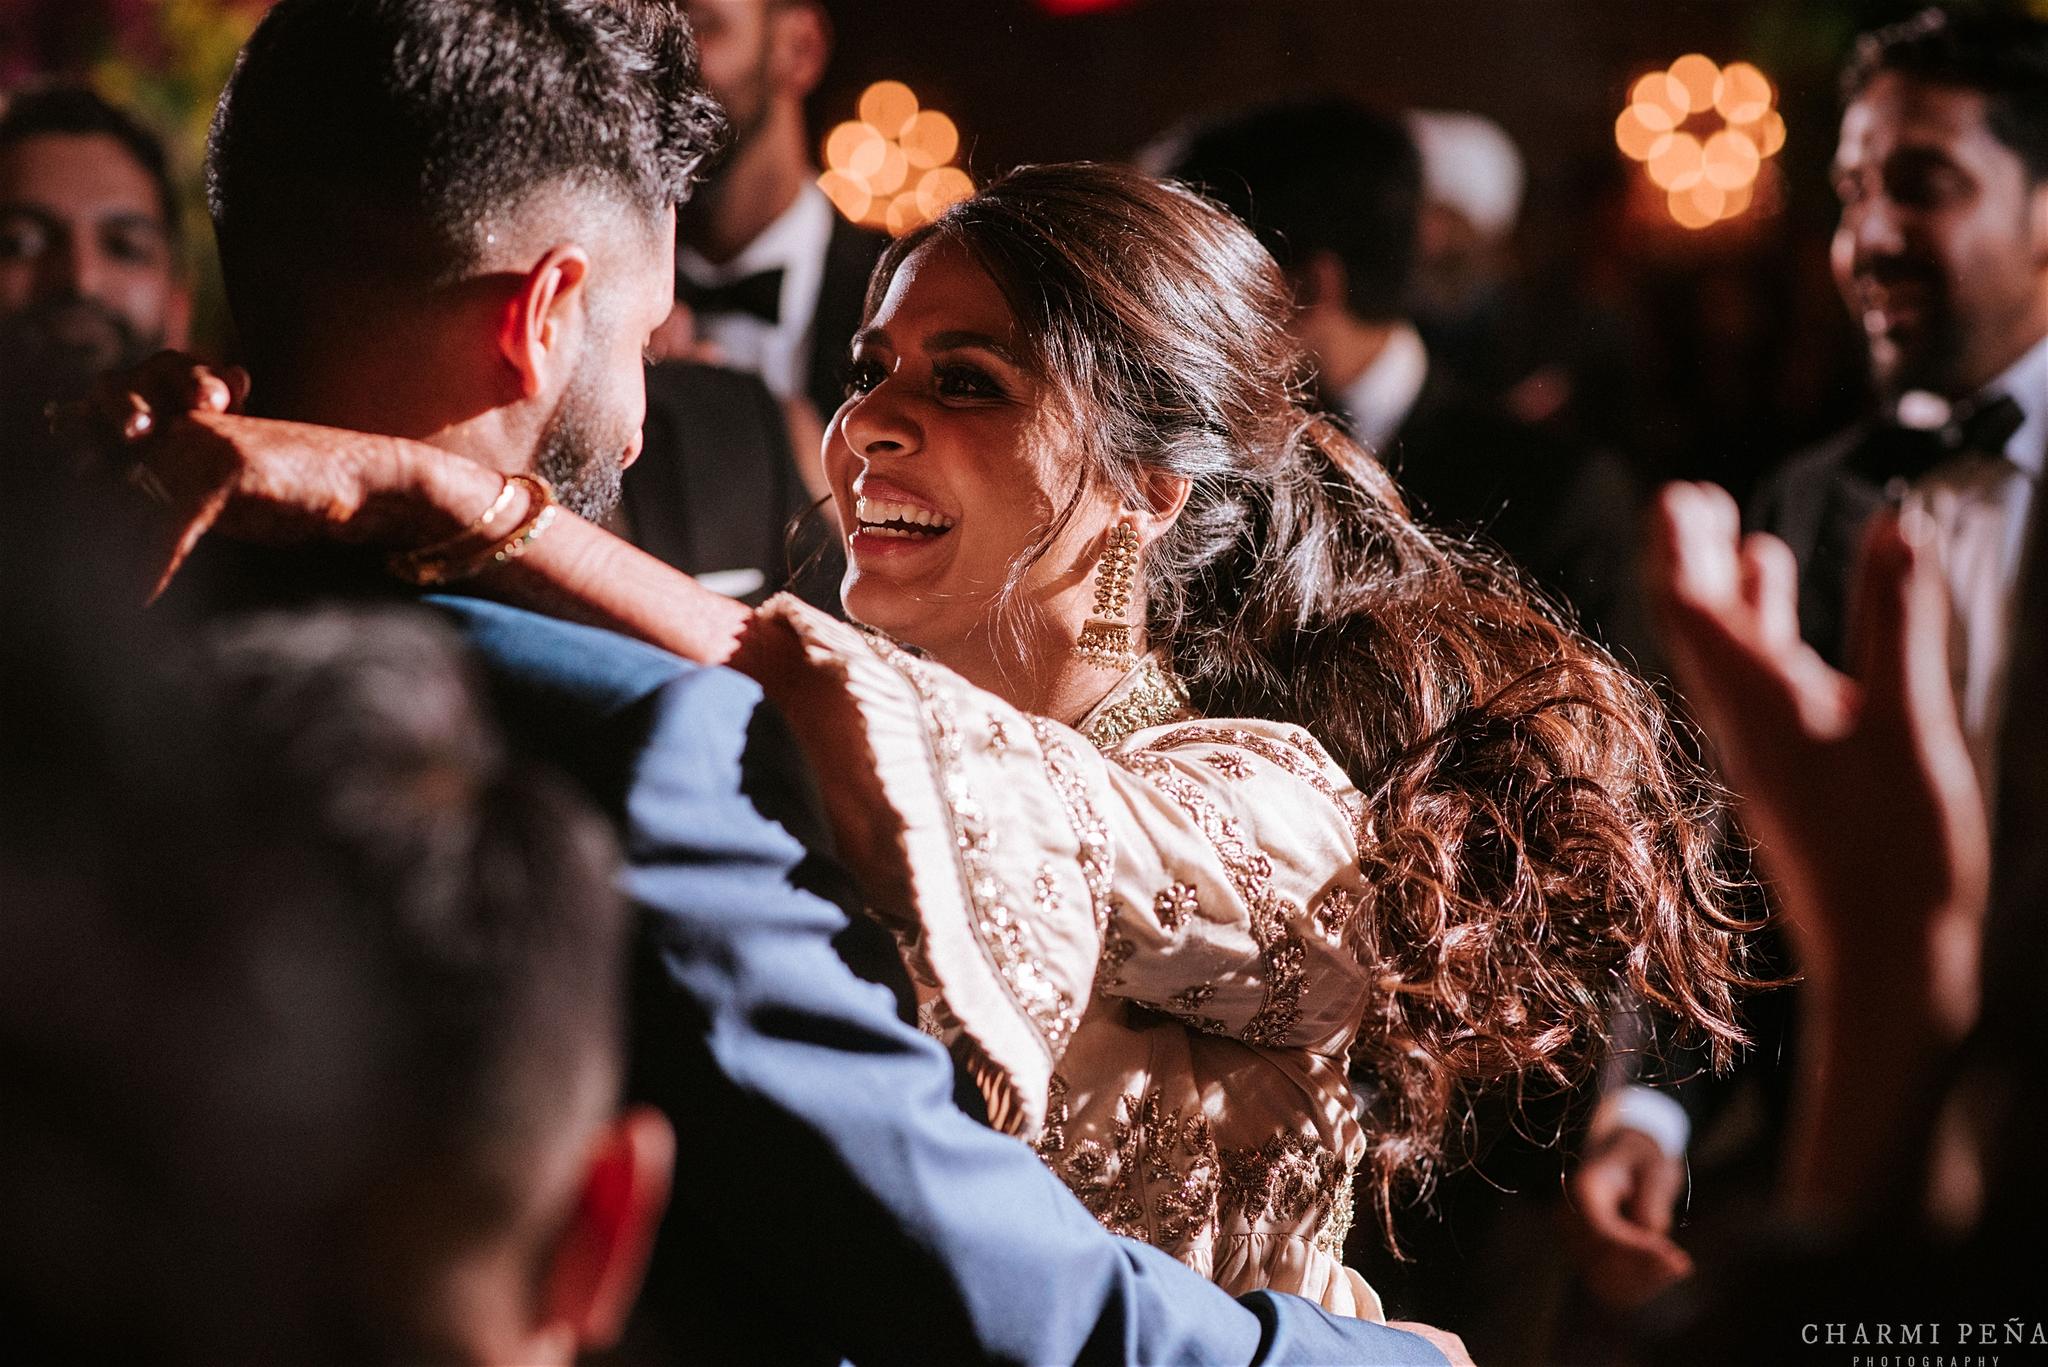 INDIAN WEDDING BRIDE DANCING.jpg